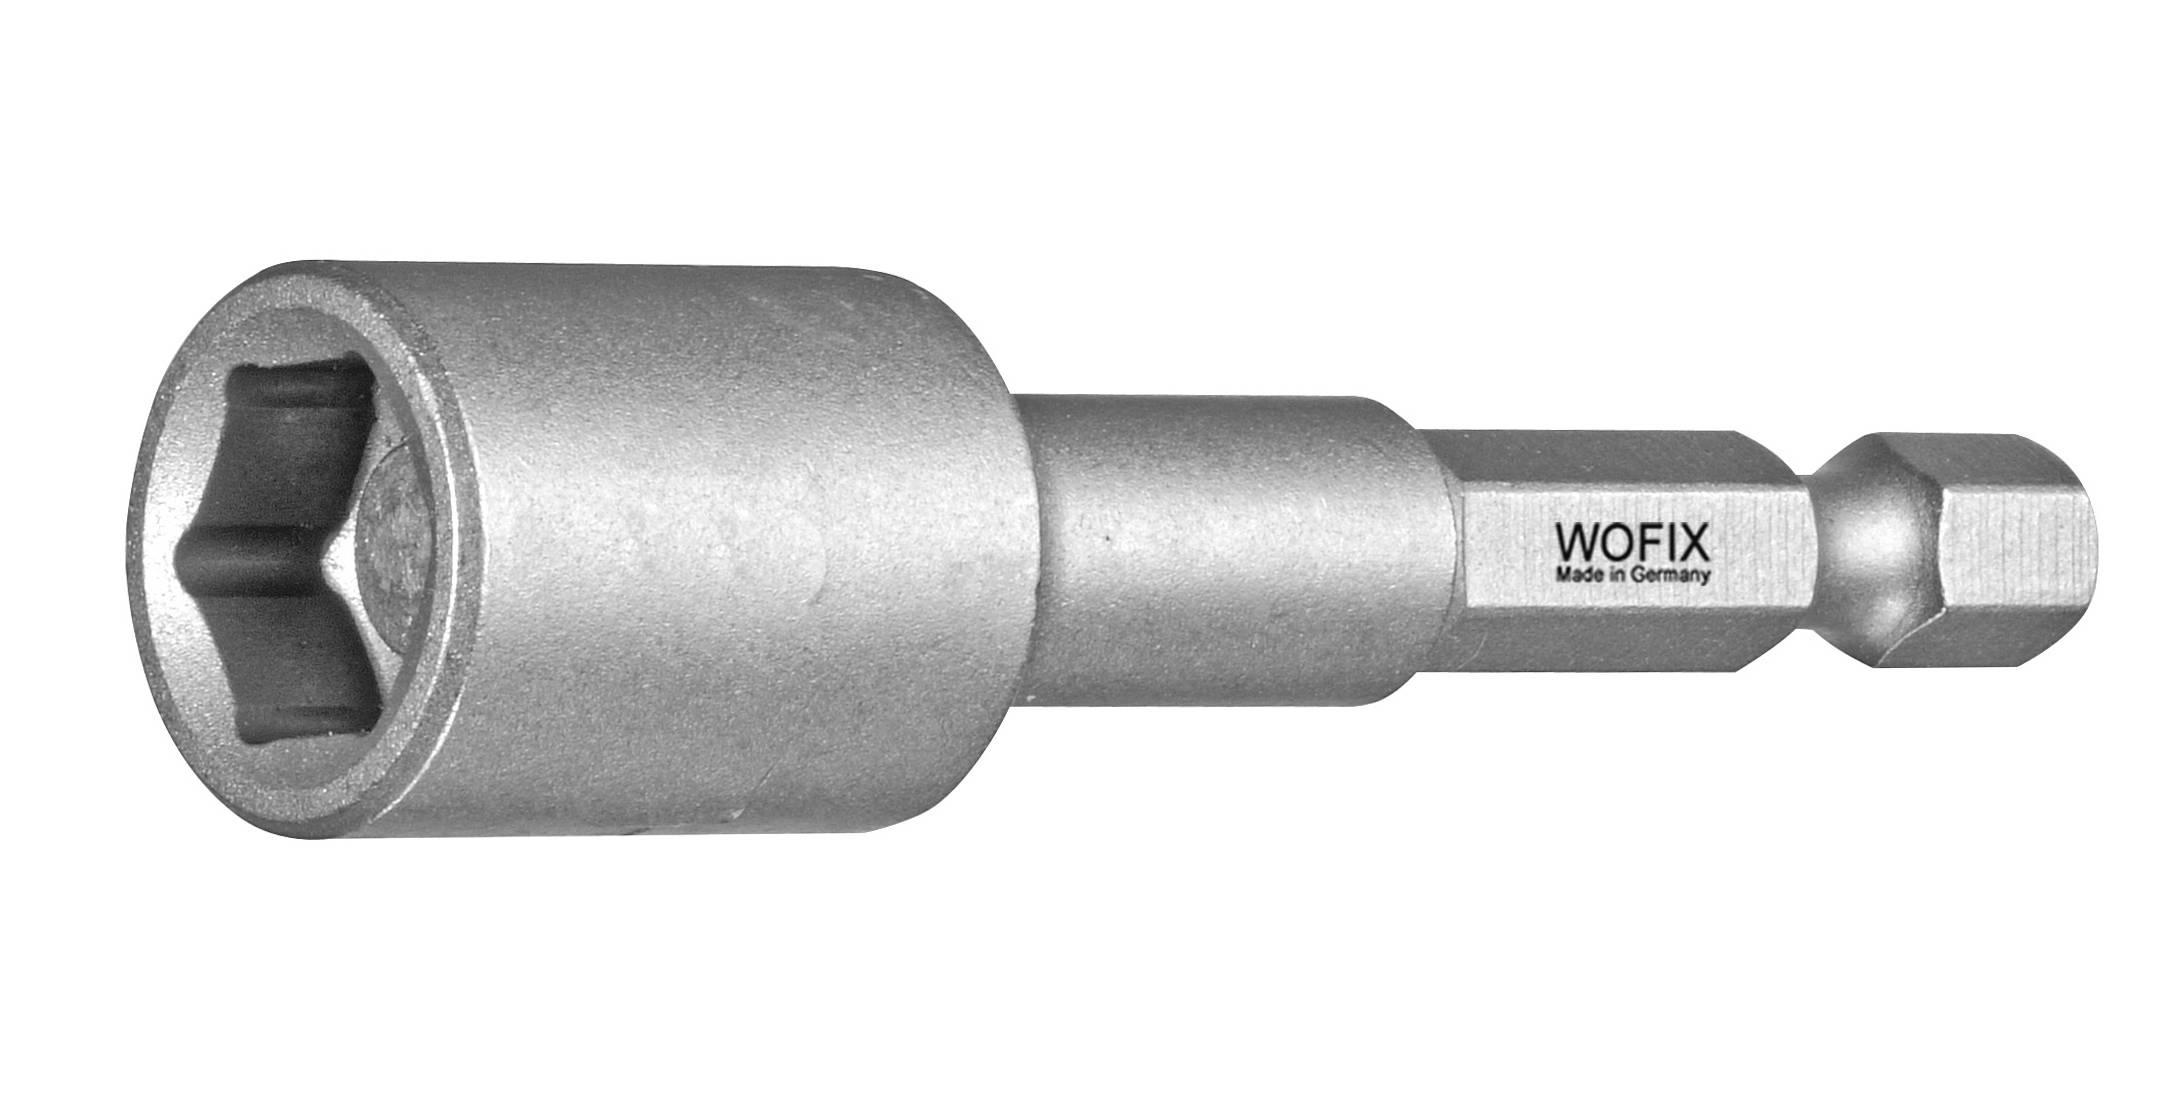 Wofix 7358100 Professional standard Dopbit - SW10,0 50 mm